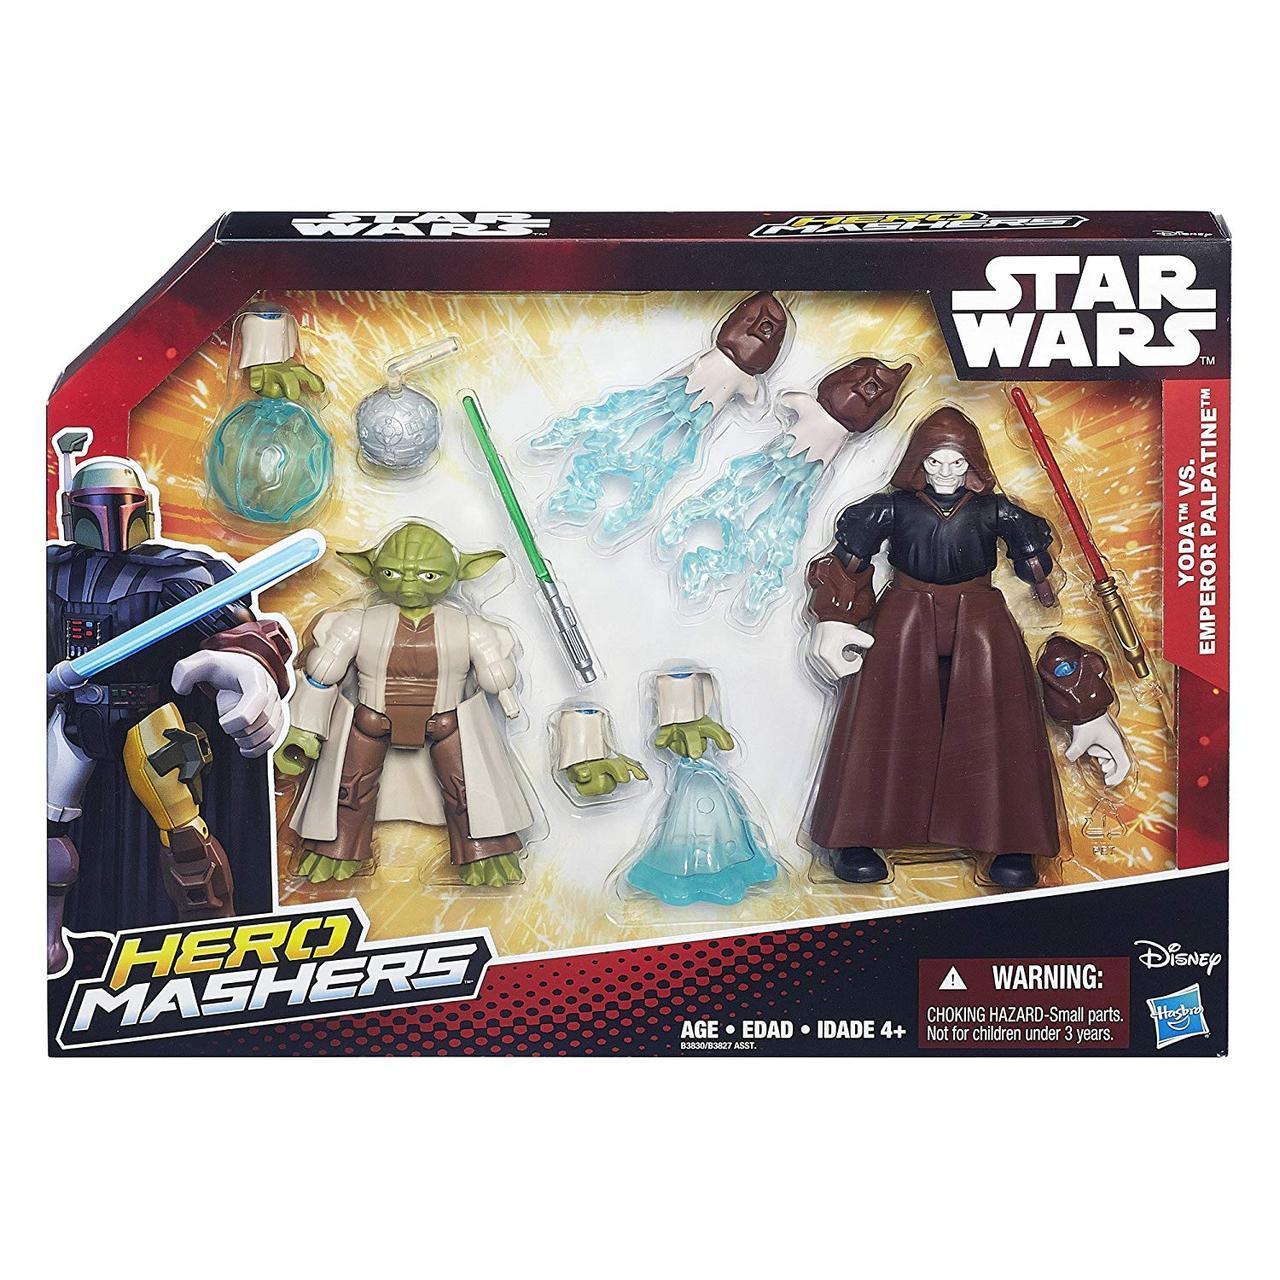 Разборные фигурки мастер Йода и император Палпатин, Машерс - Yoda, Emperor Palpati, Star Wars, Mashers, Hasbro